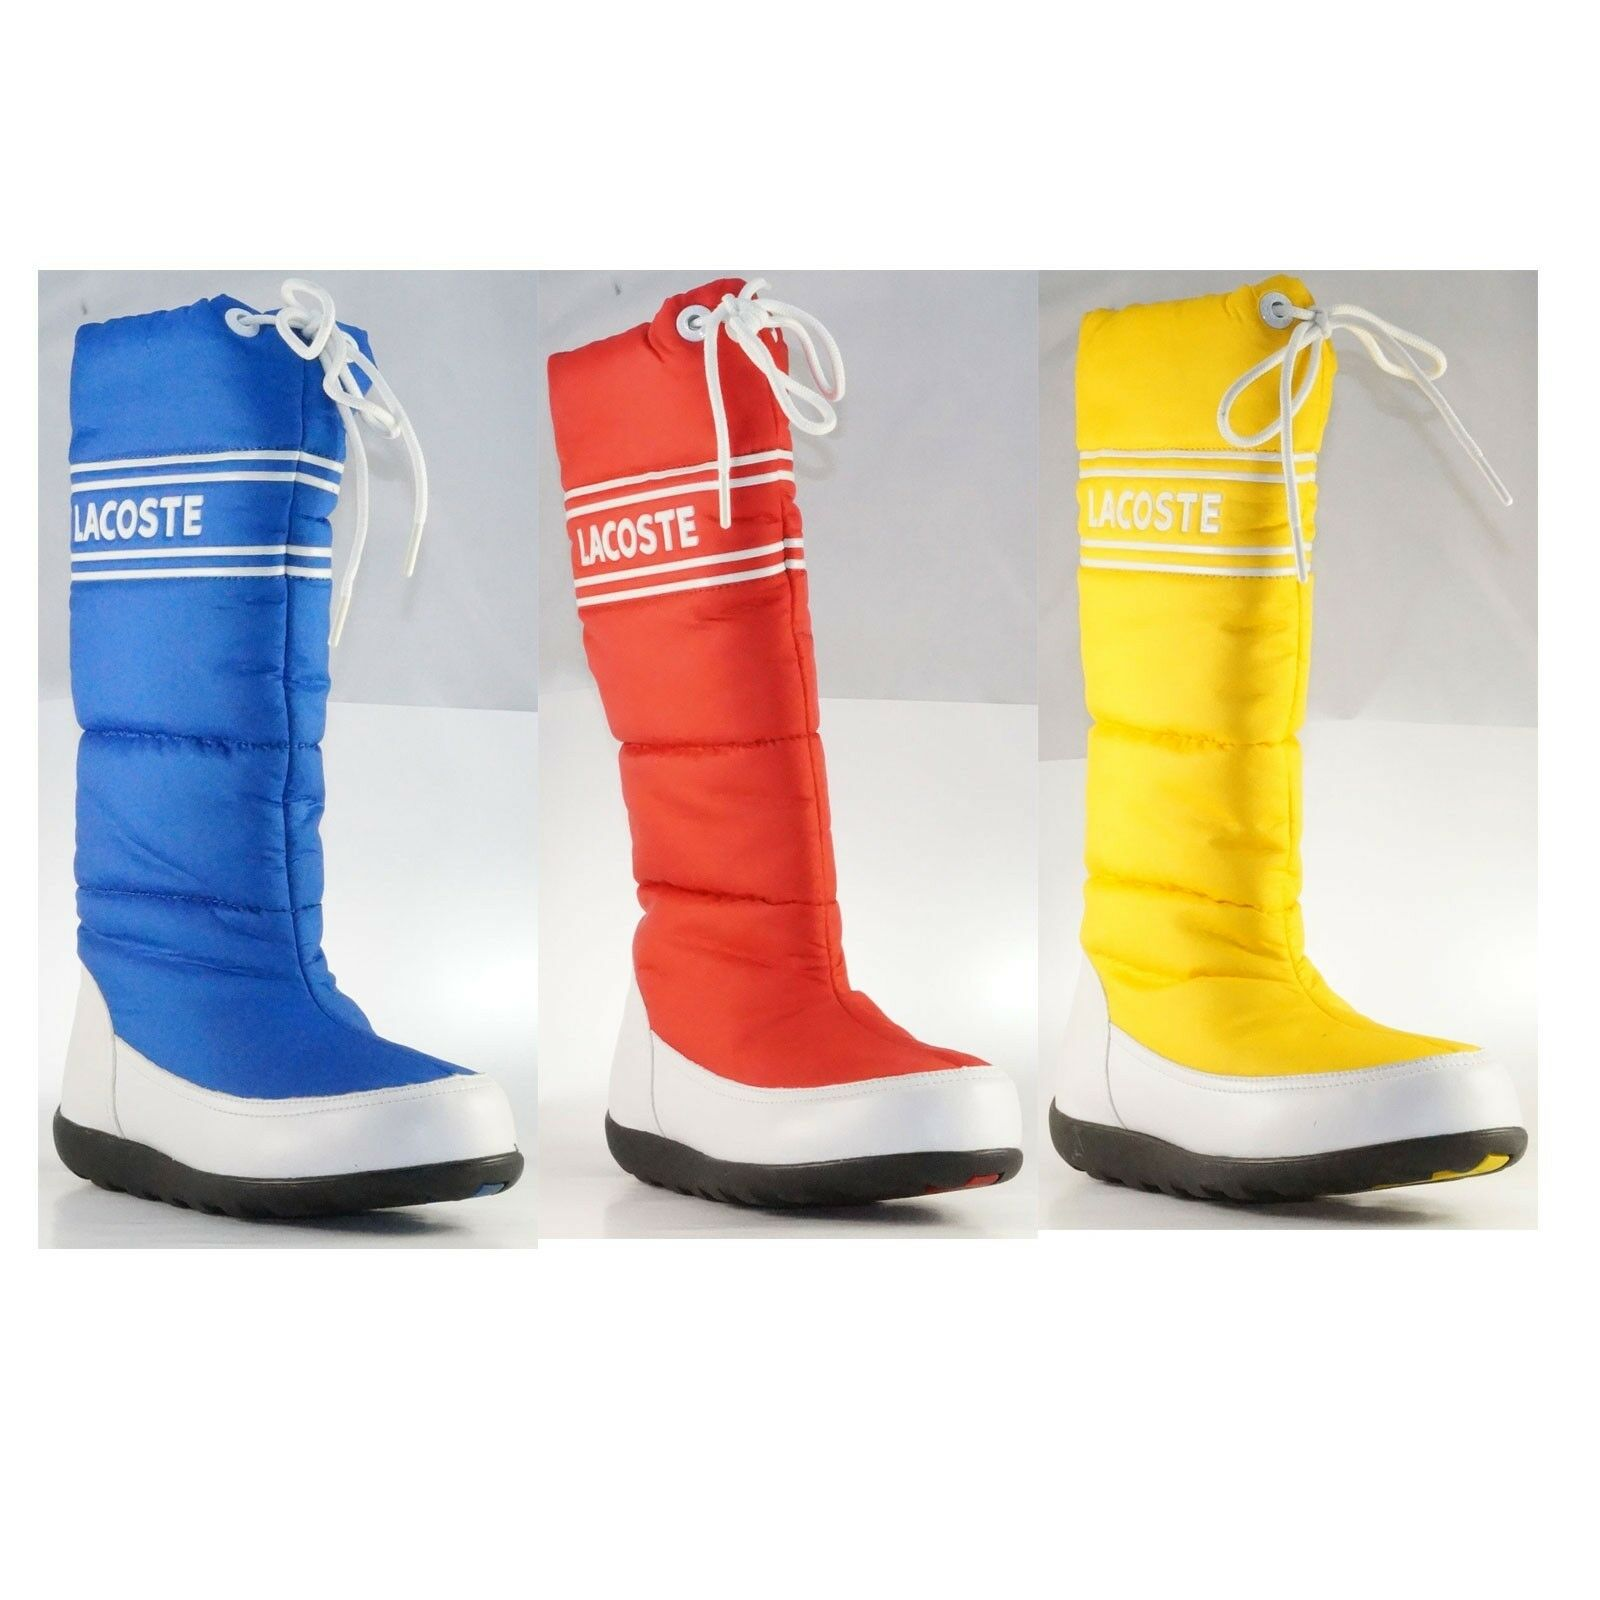 Lacoste Snug 37-40.5 NEW  Winter Stiefel Snow Stiefel Stiefel Trainer